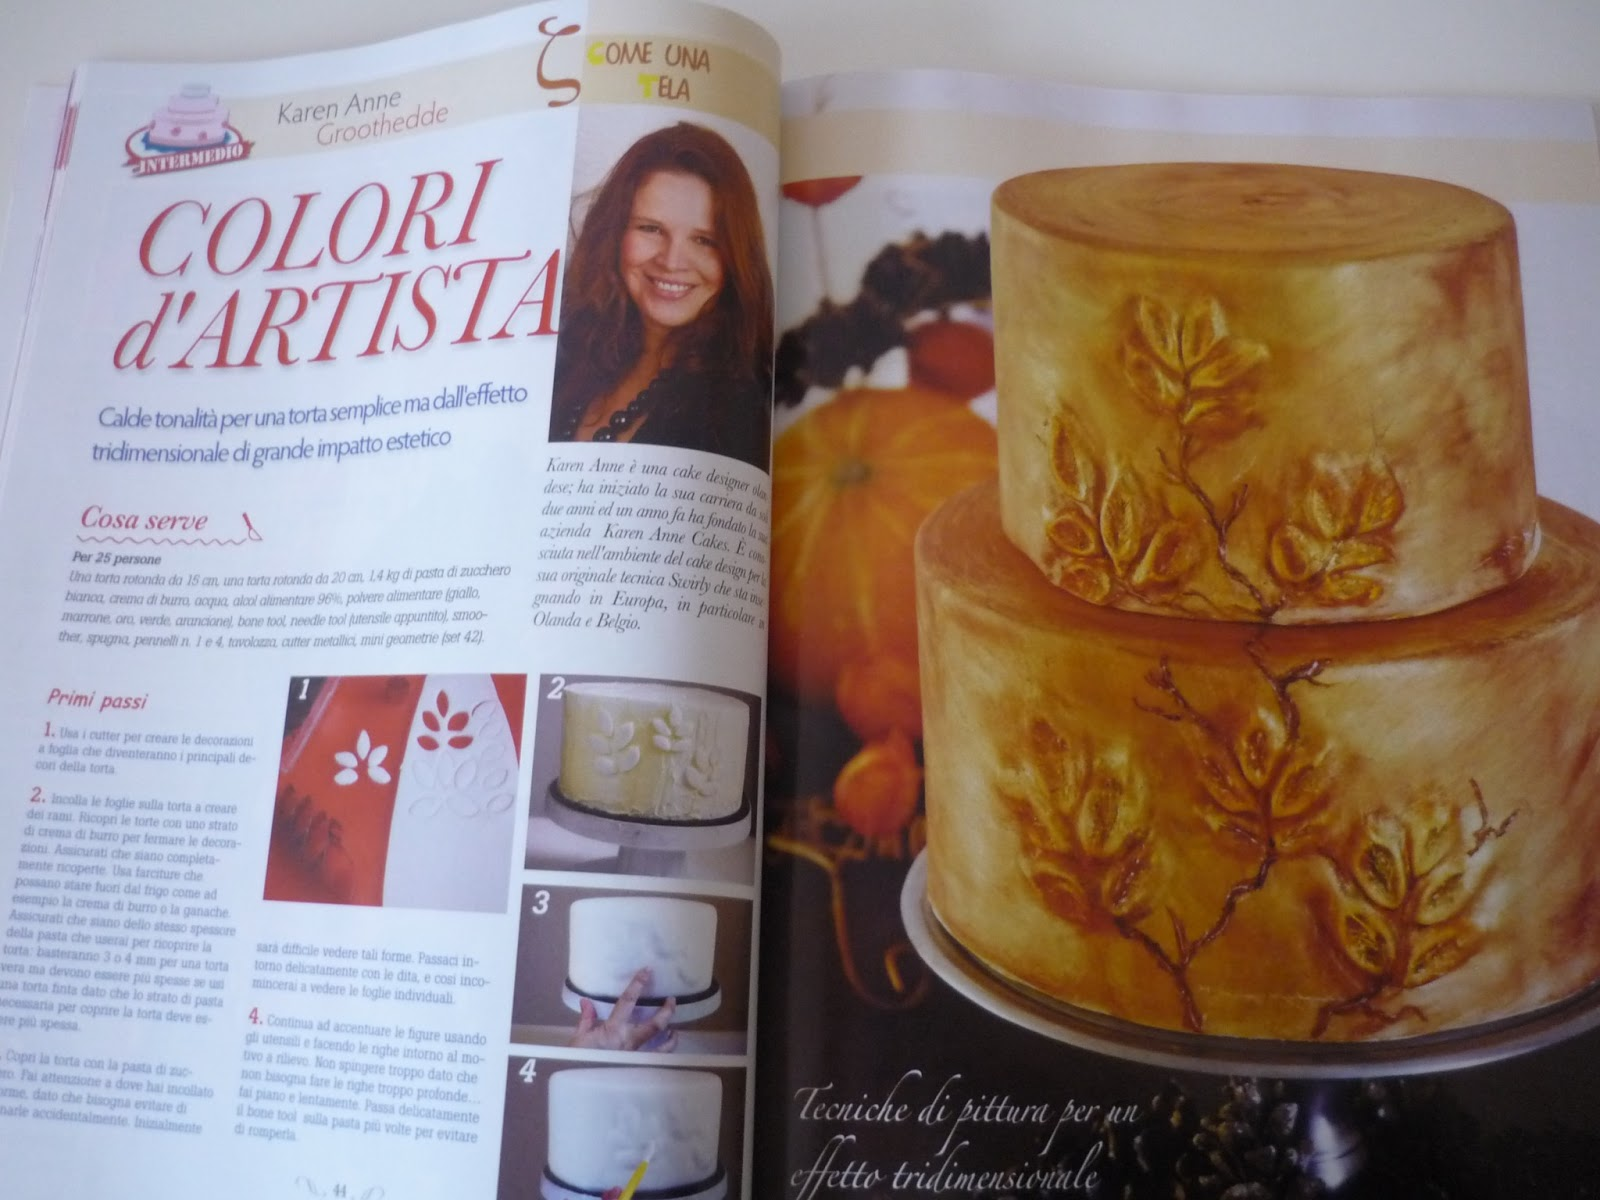 Karen Anne Cakes: Karen Anne Cakes in Cucina Chic Cake Design Magazine